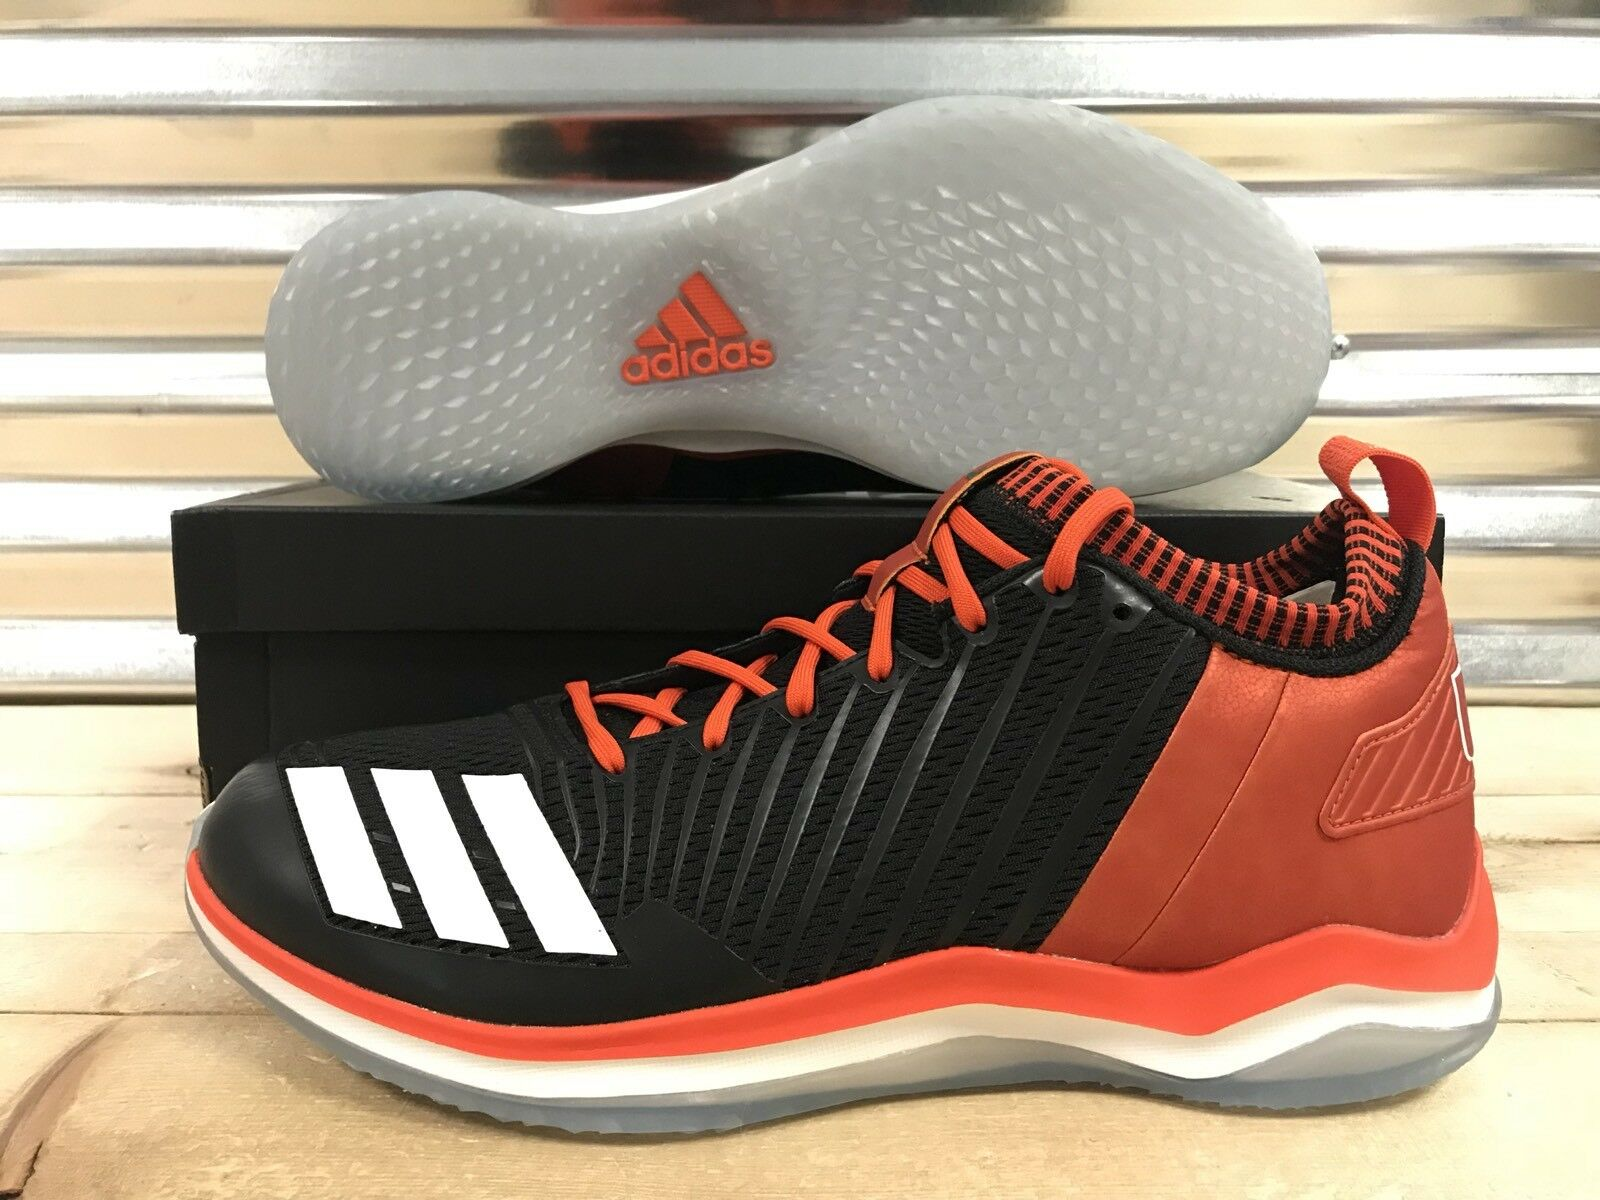 Adidas Icon Trainer NCAA Miami Hurricanes um de Omaha zapatos Negro reducción de um precio 0654e7